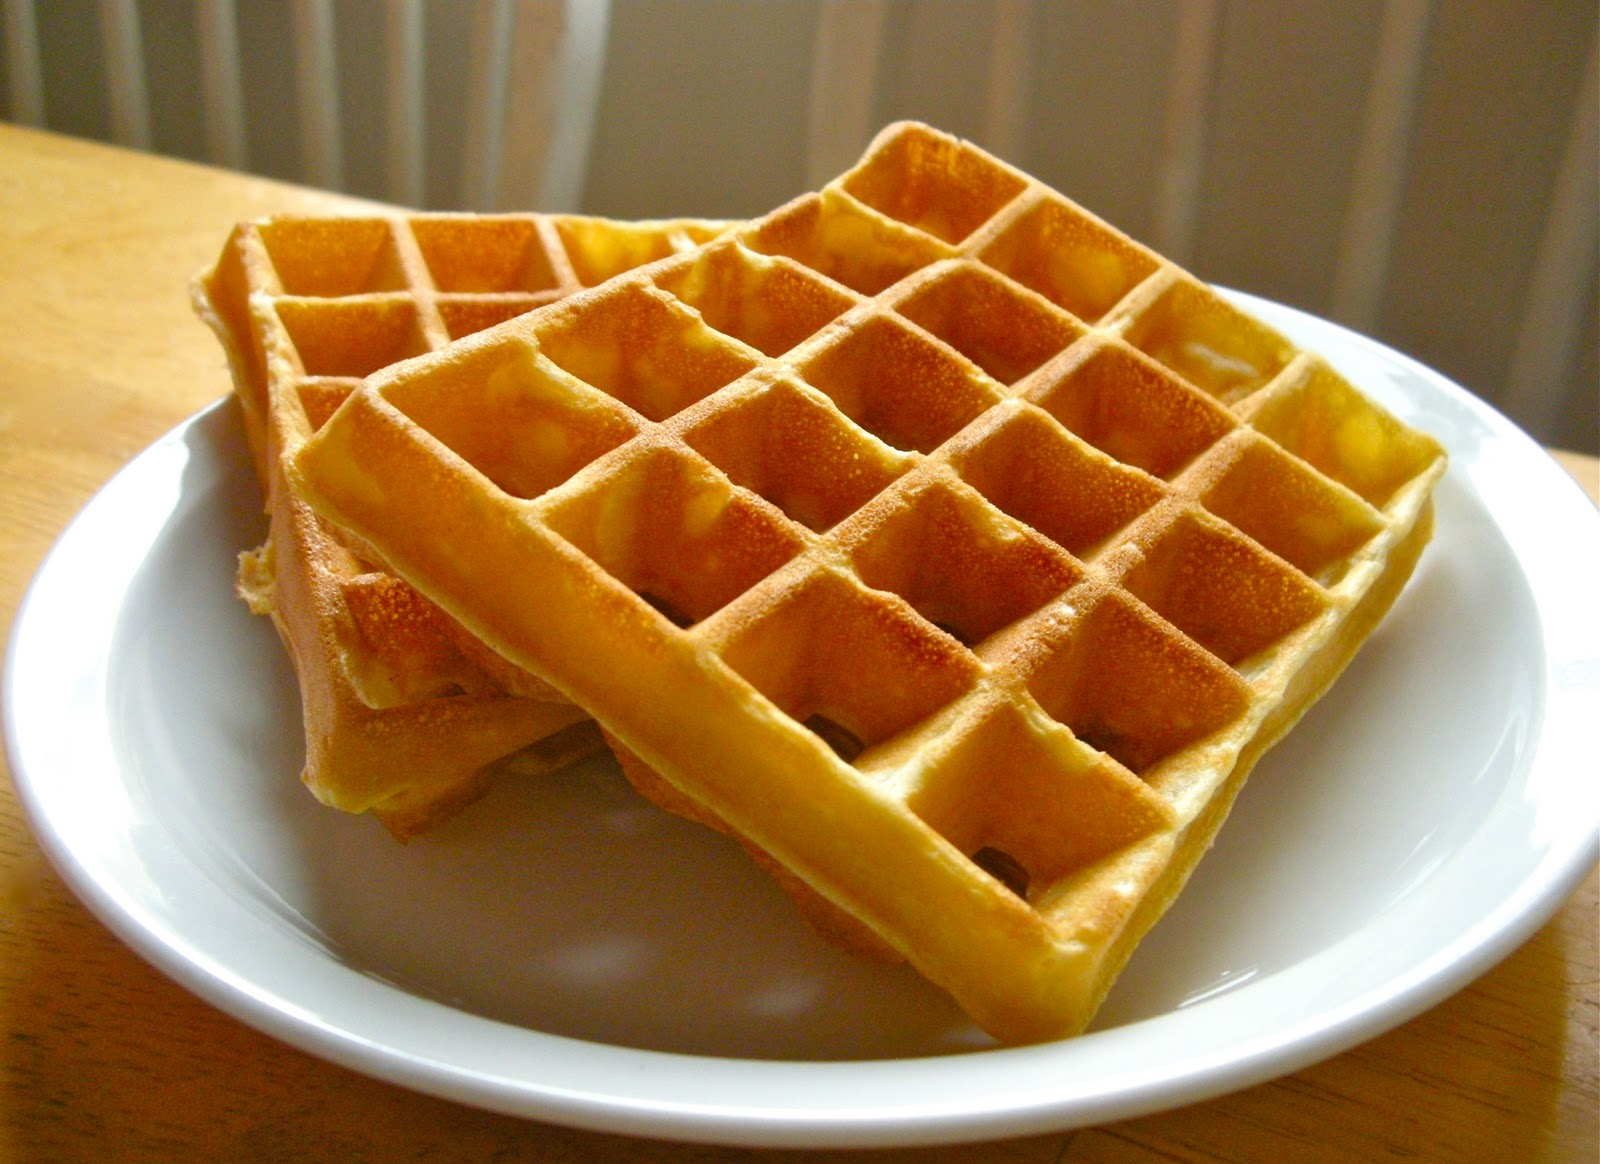 Foodism mom 2011 02 20 waffle of insane greatness recipe courtesy aretha frankensteins forumfinder Gallery